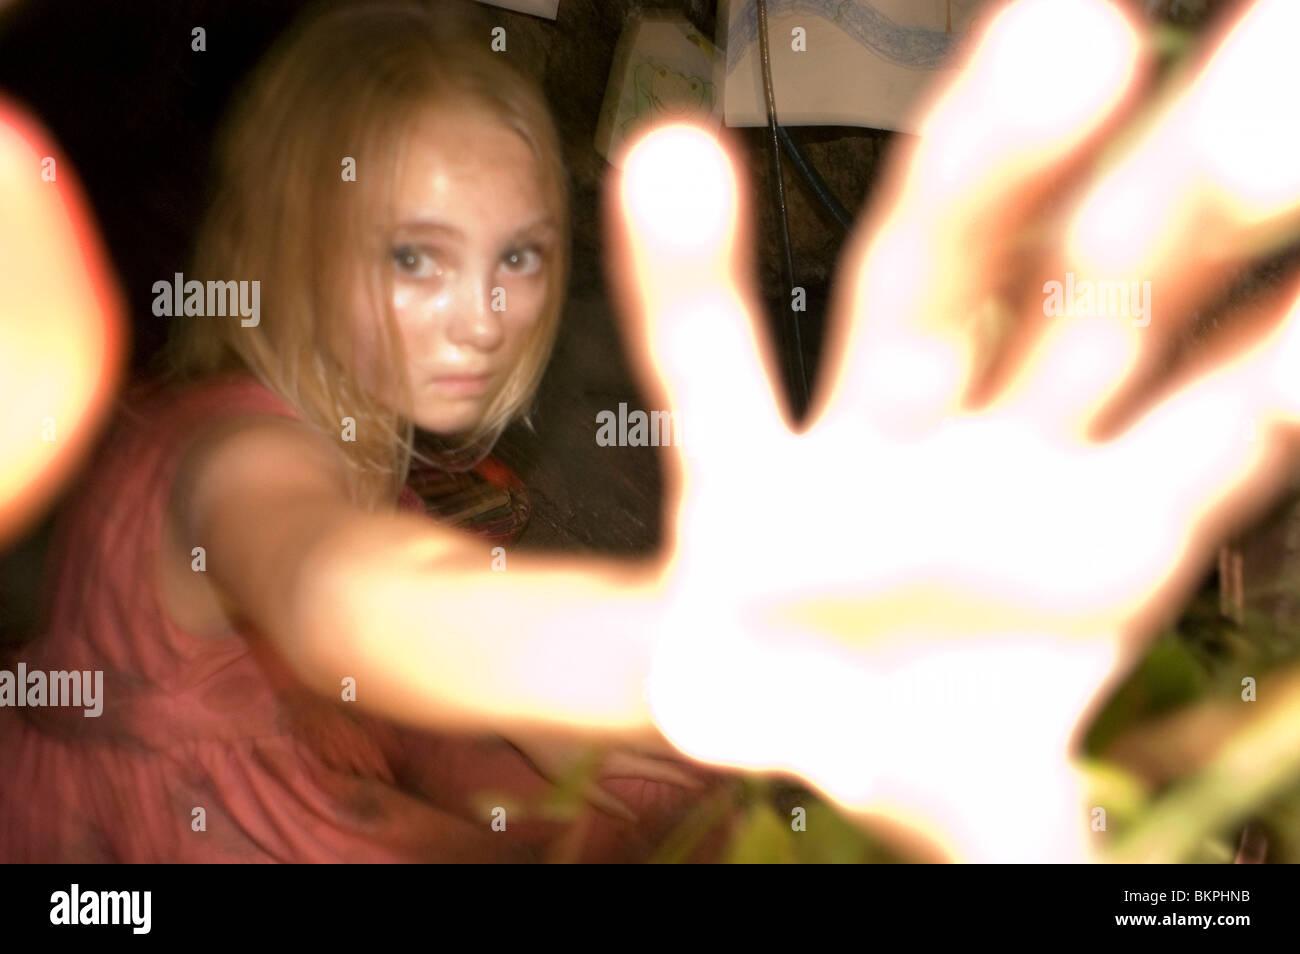 THE REAPING (2007) ANNASOPHIA ROBB REAP 001-03 - Stock Image